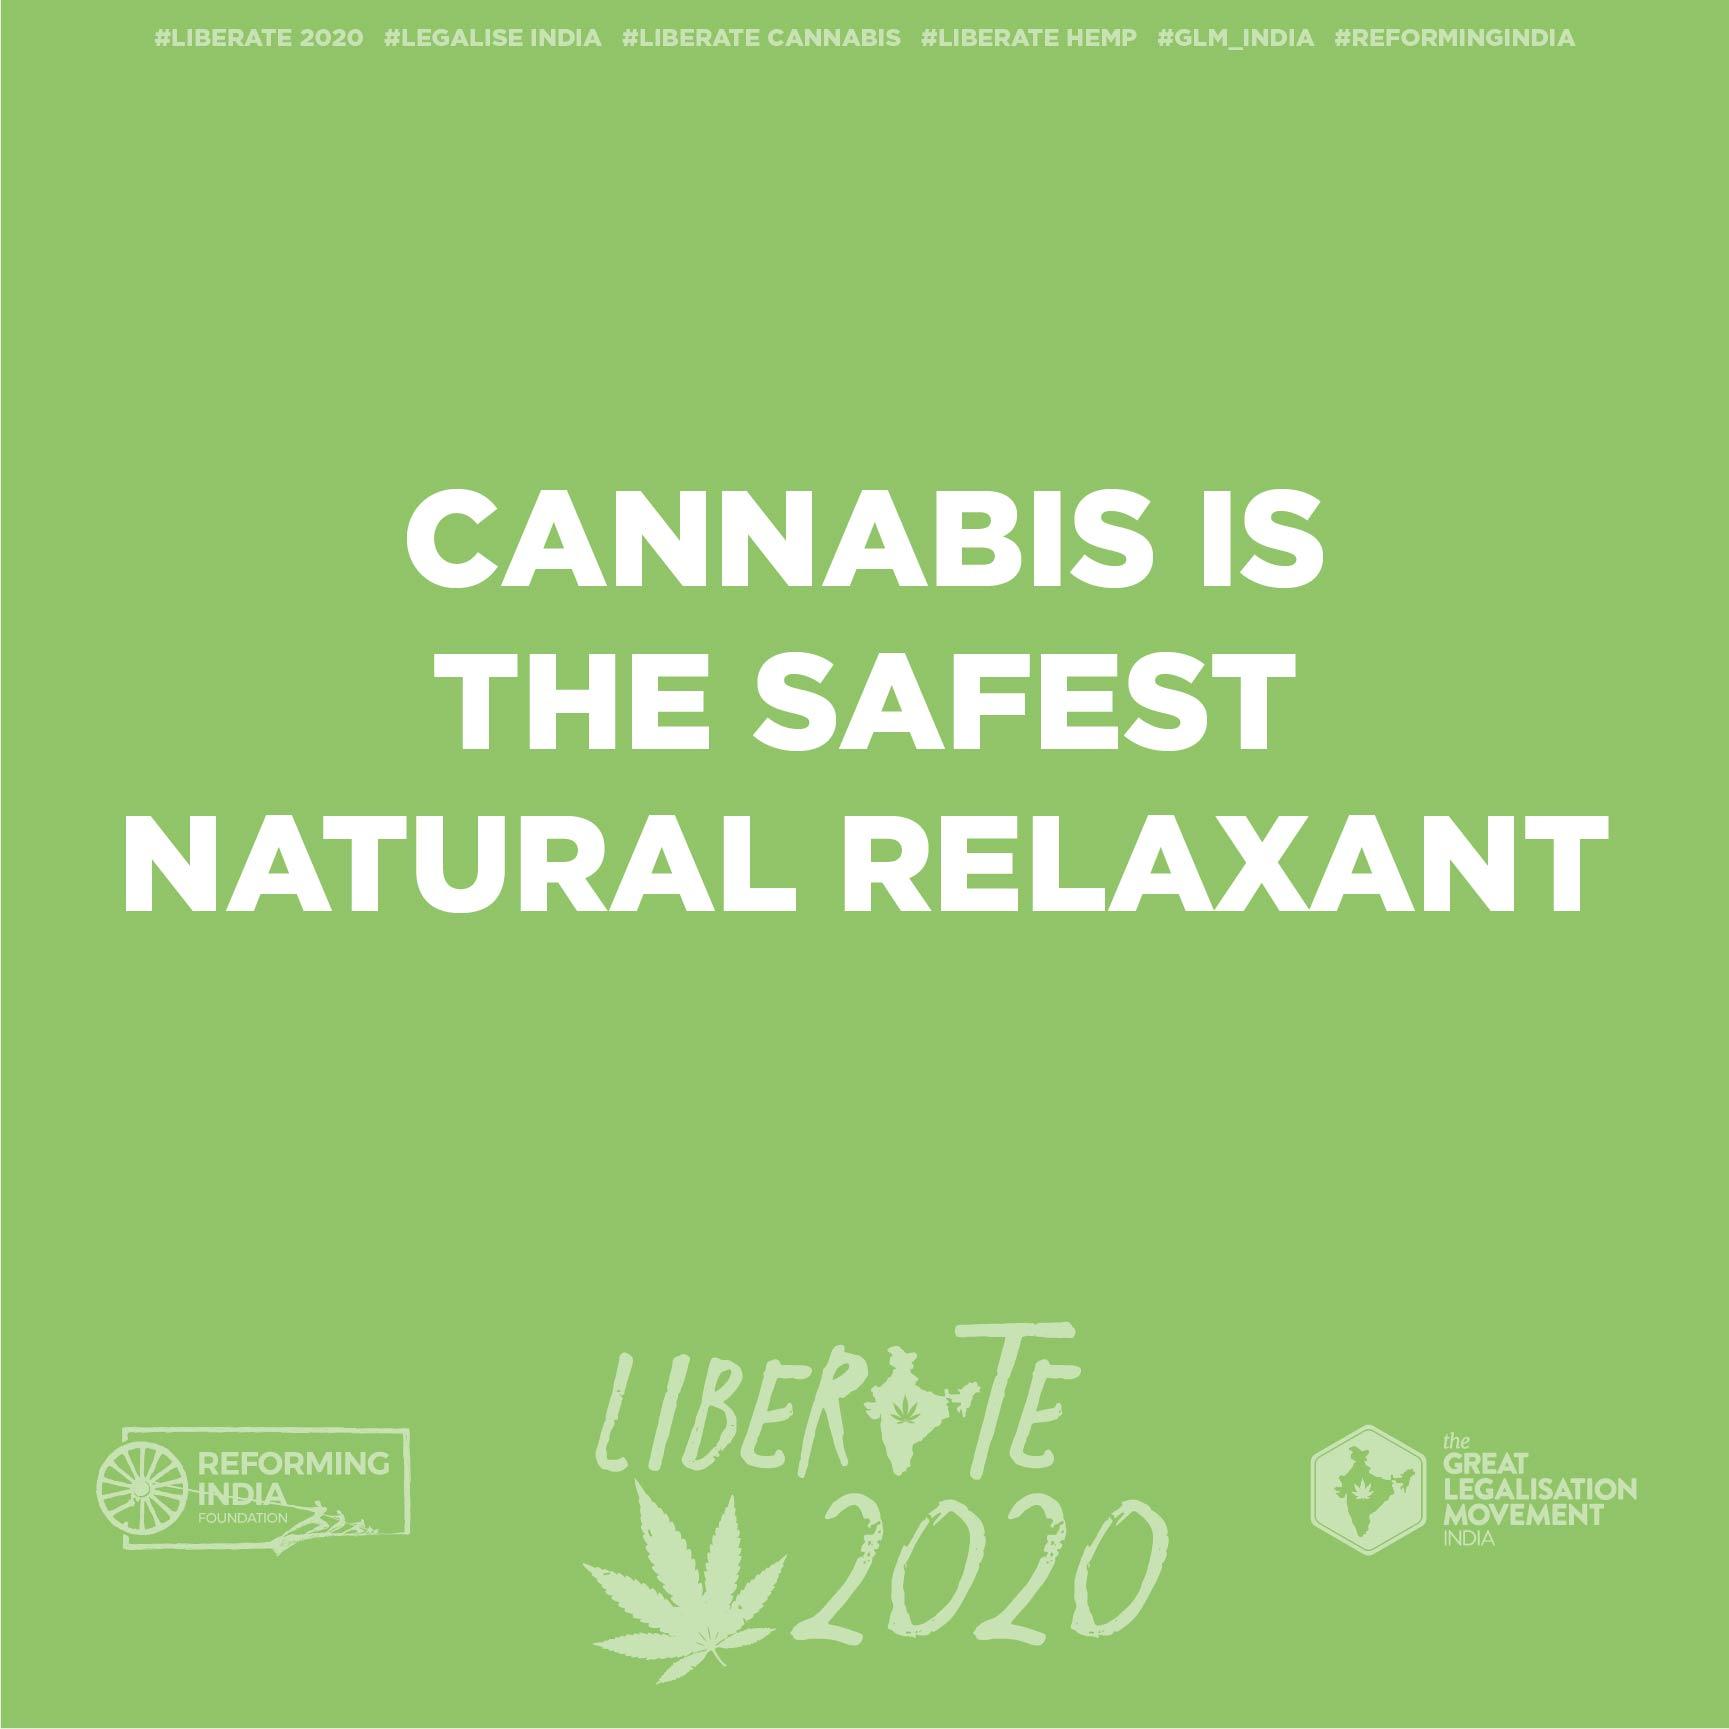 cannabisArtboard 1 copy 6-50.jpg